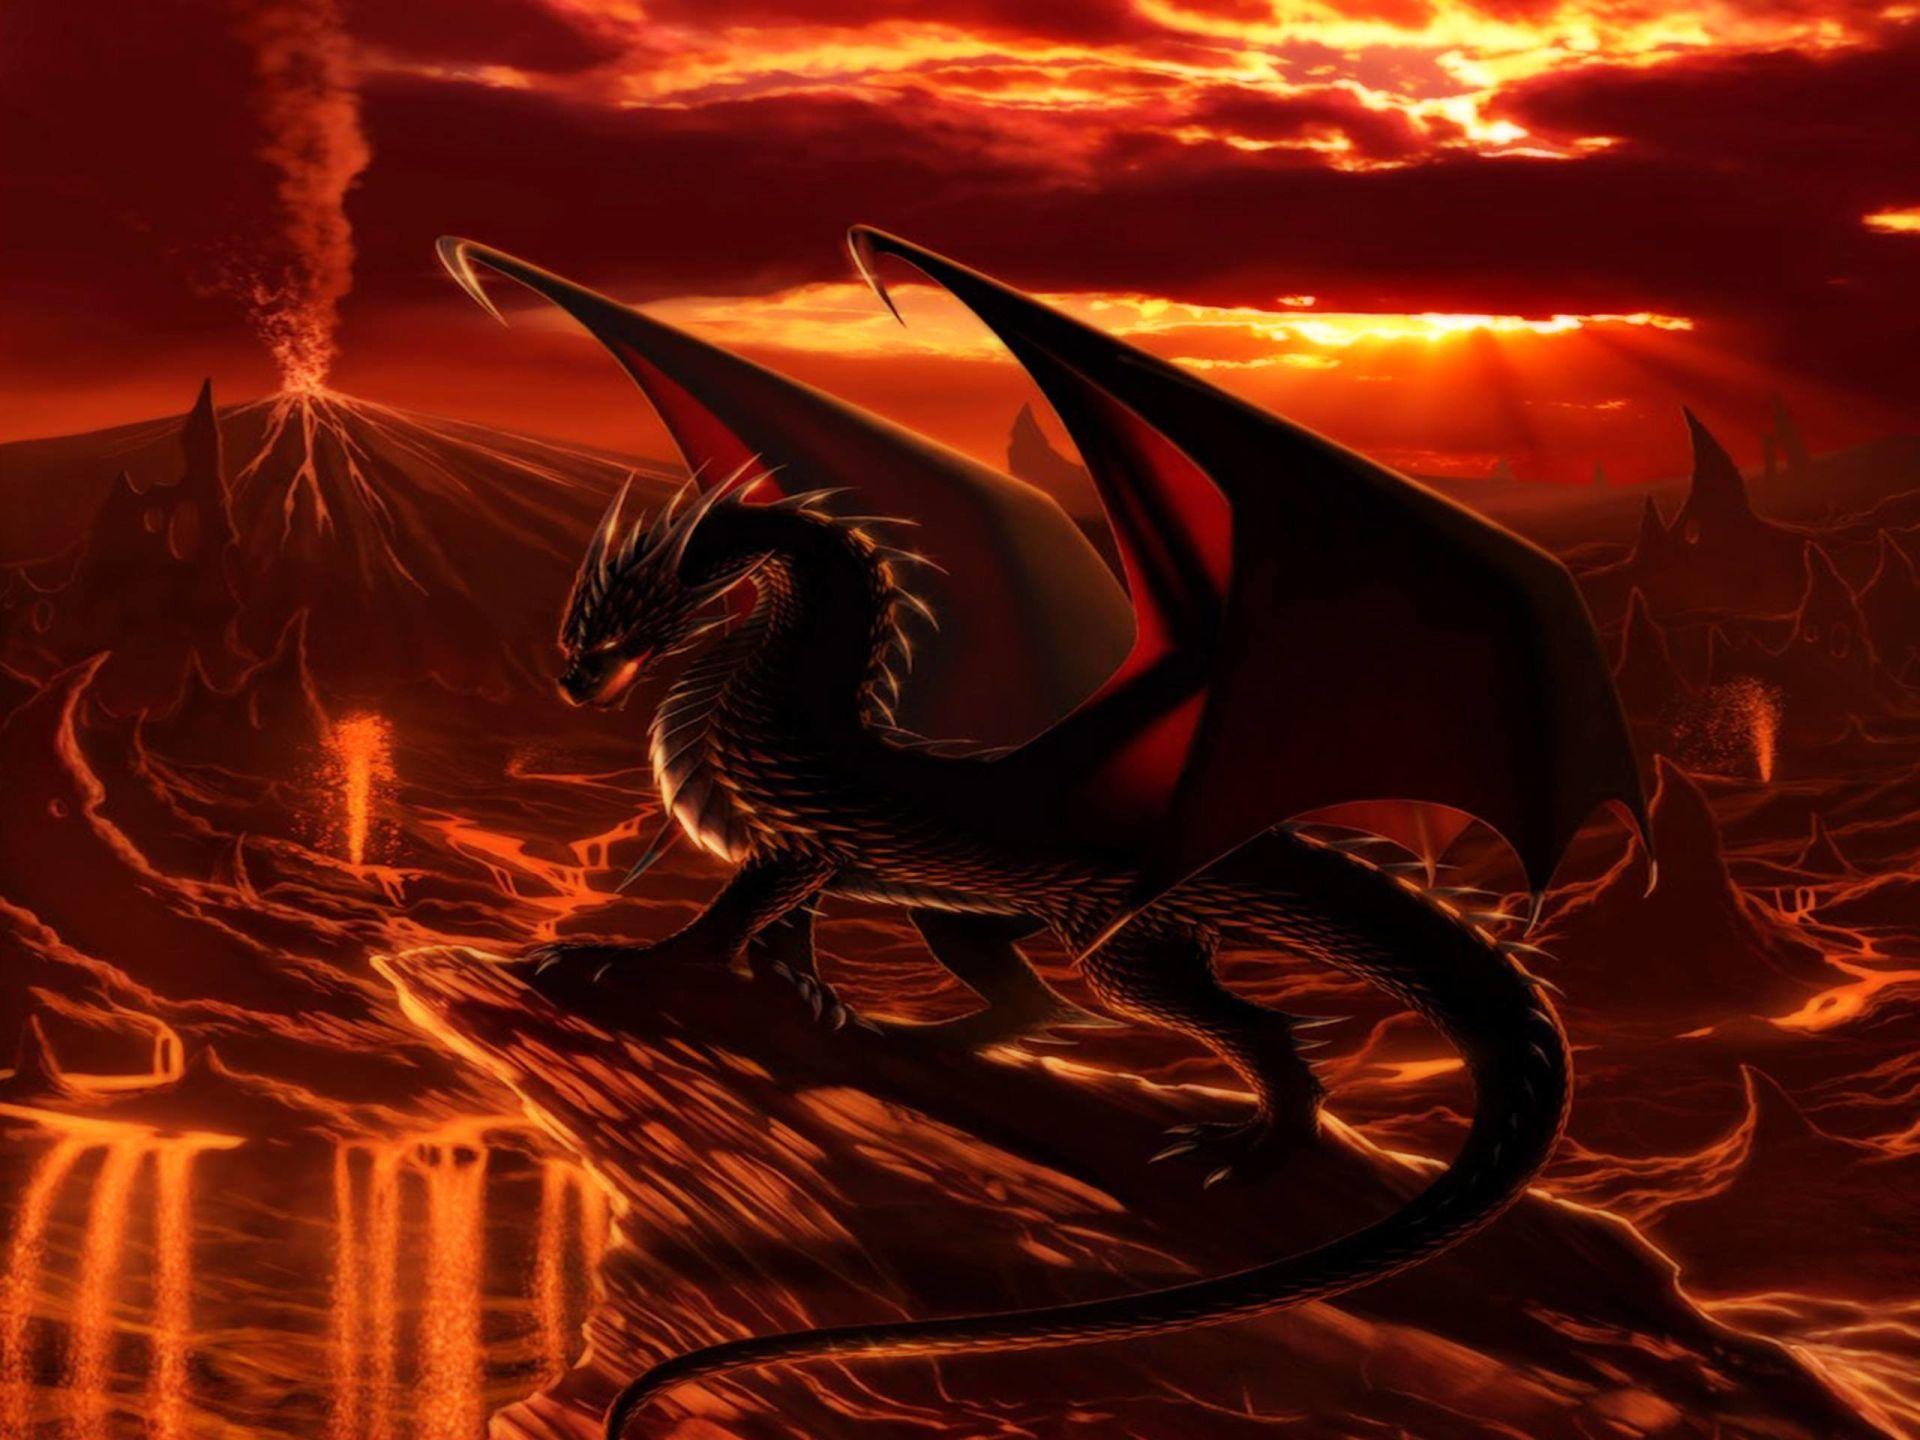 dragon background image